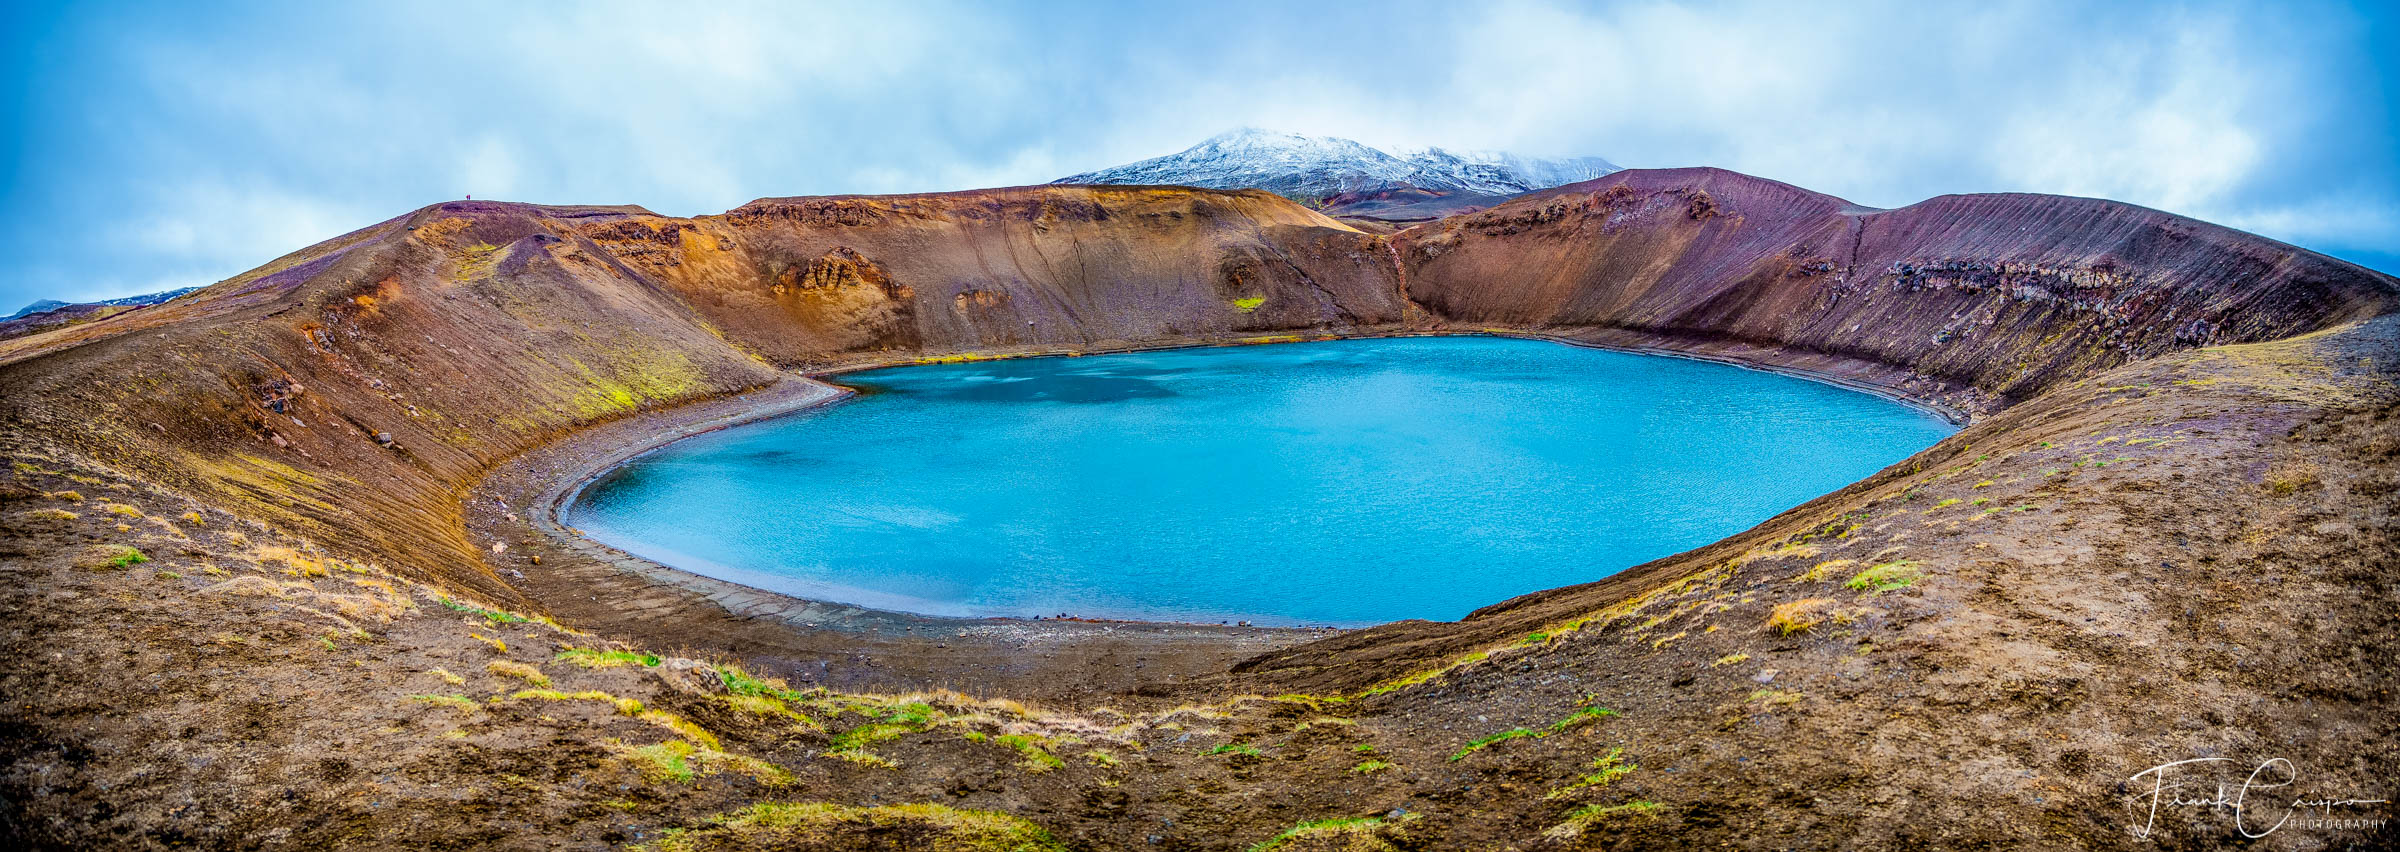 Viti Crater